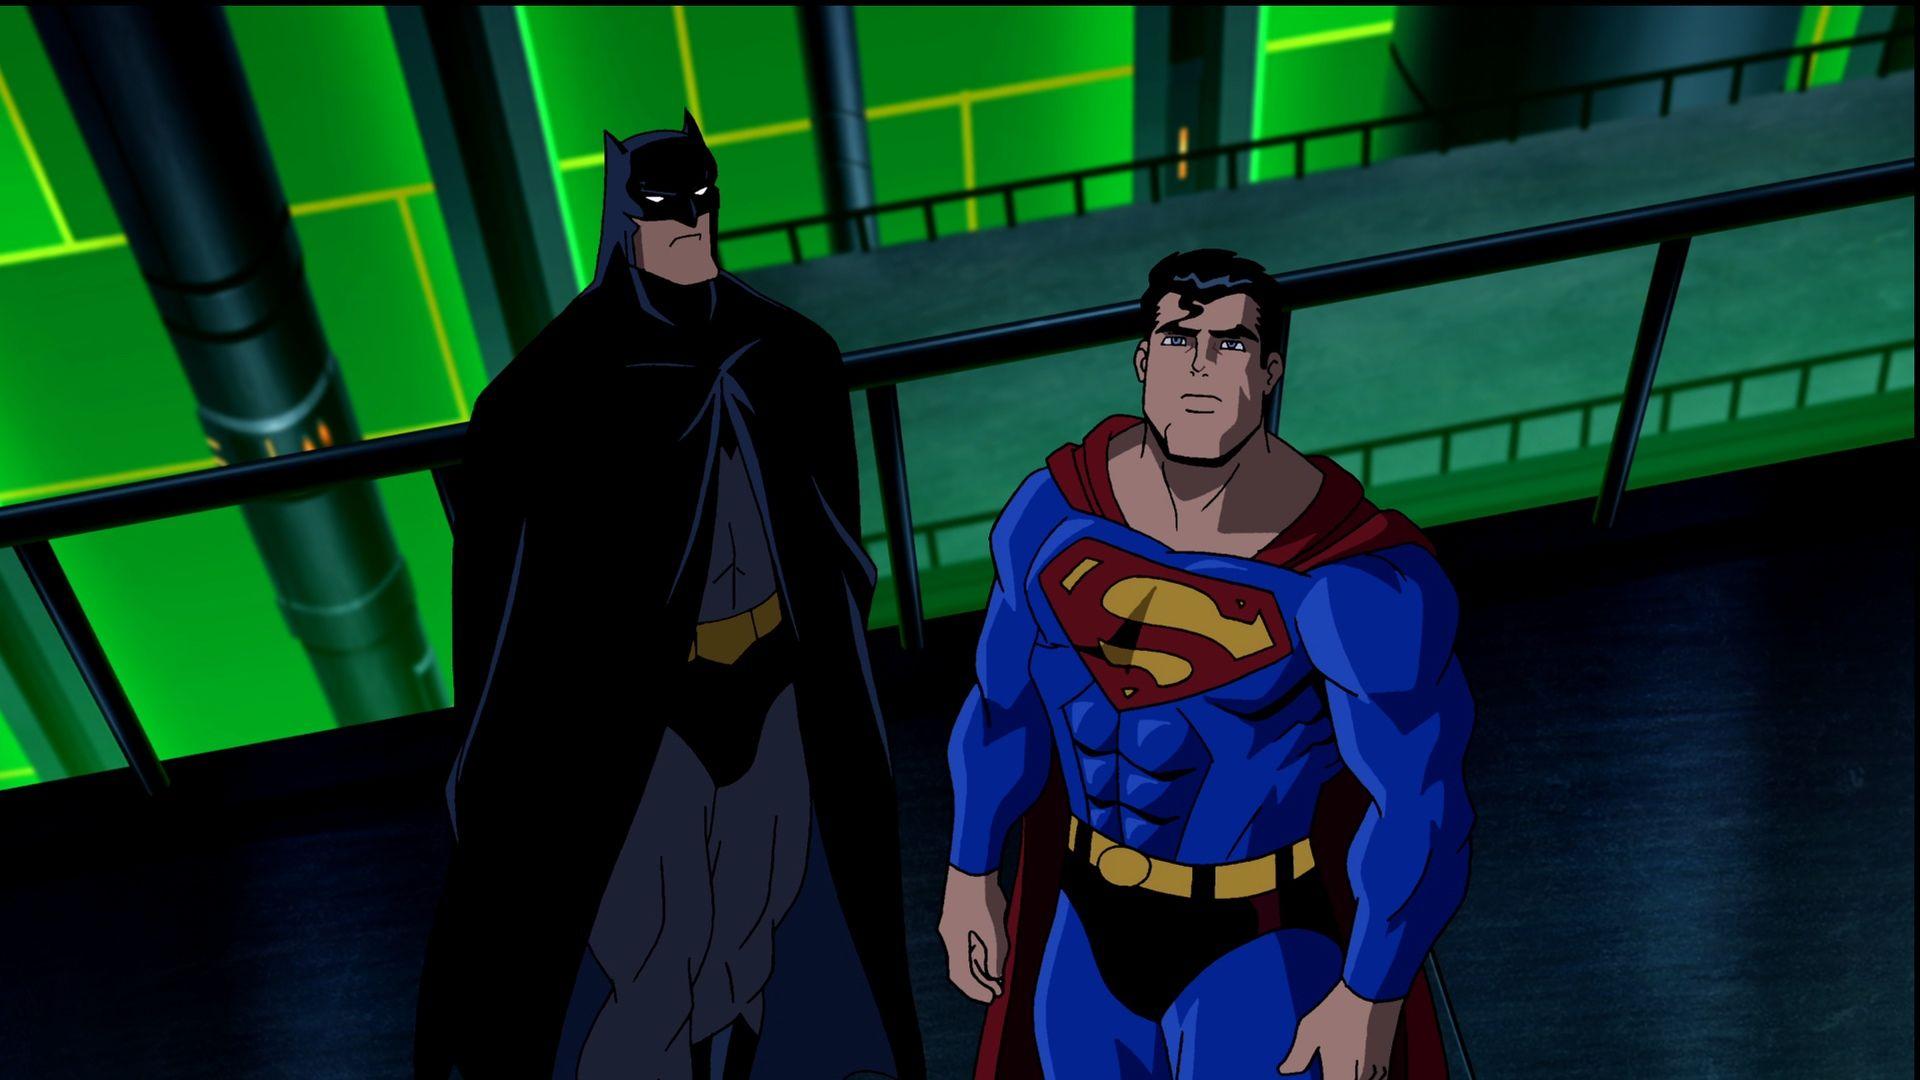 Ultra HD K Batman Wallpapers Desktop Backgrounds 1280x720 Animated 39